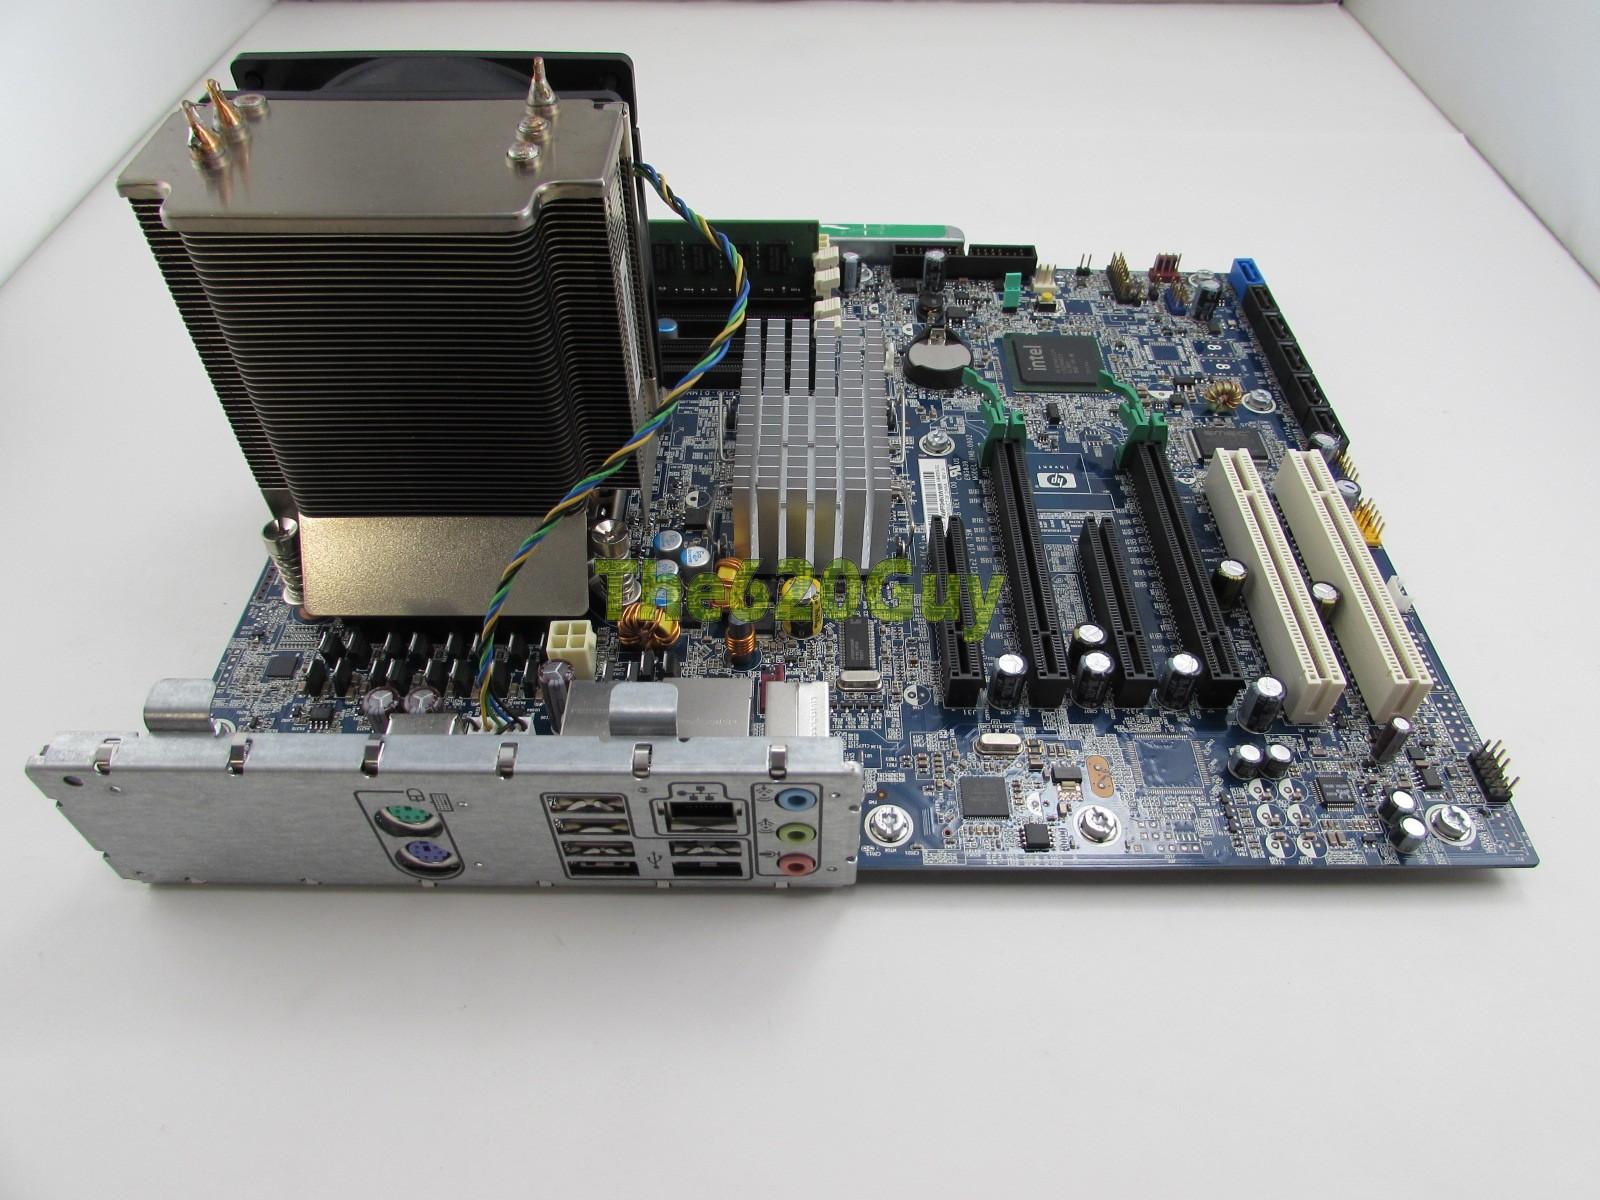 HP Z400 Workstation Motherboard 461438-001 + Xeon W3520 2 67GHz CPU + 2GB  RAM